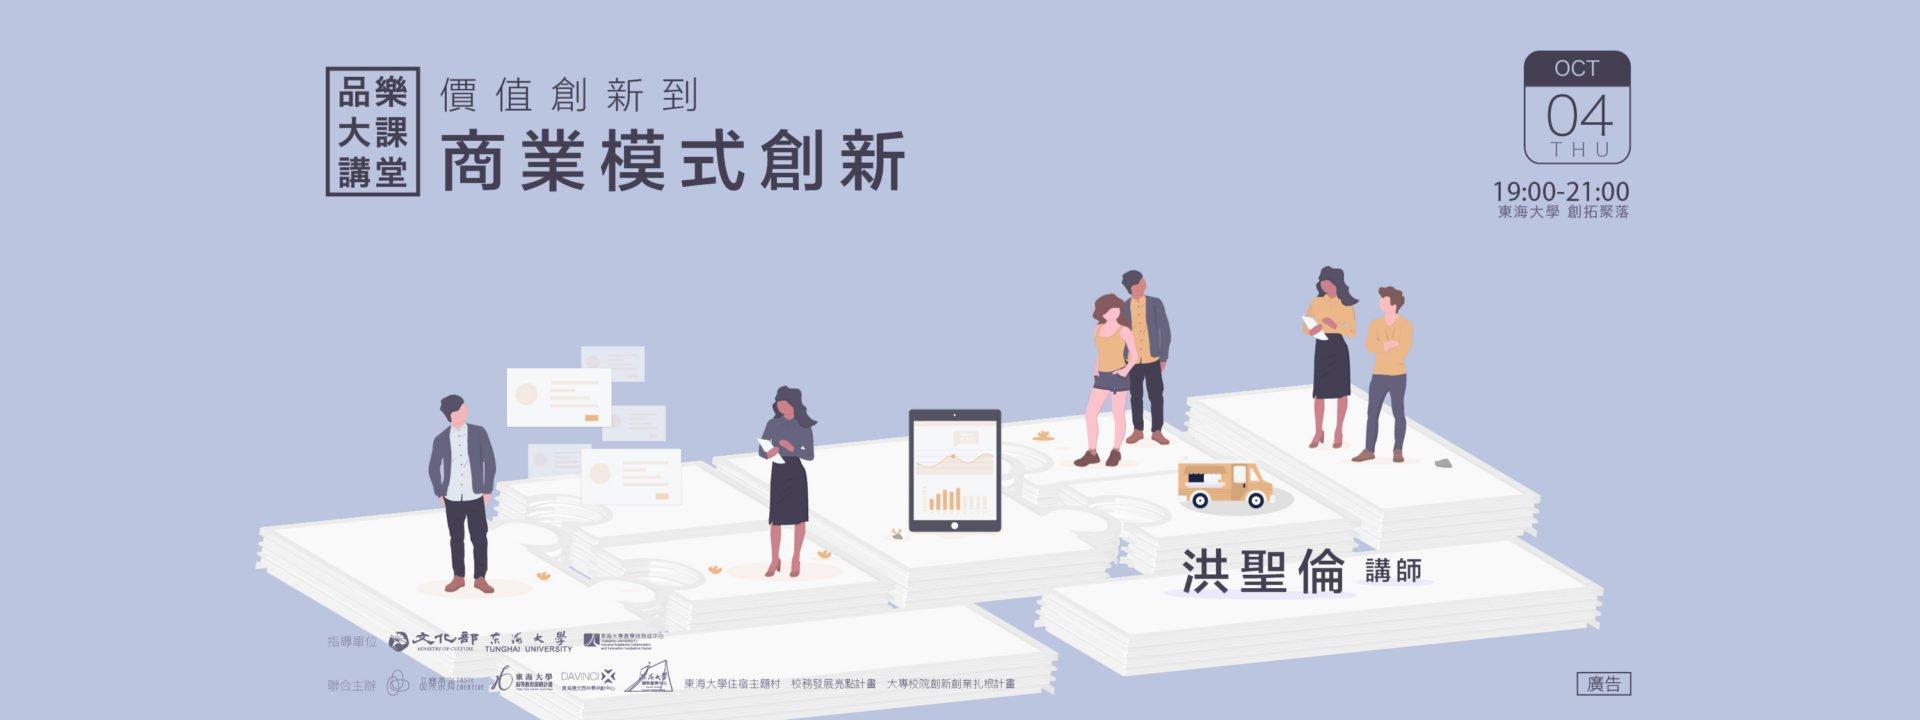 品樂大課講堂-商業模式banner(1440_540)